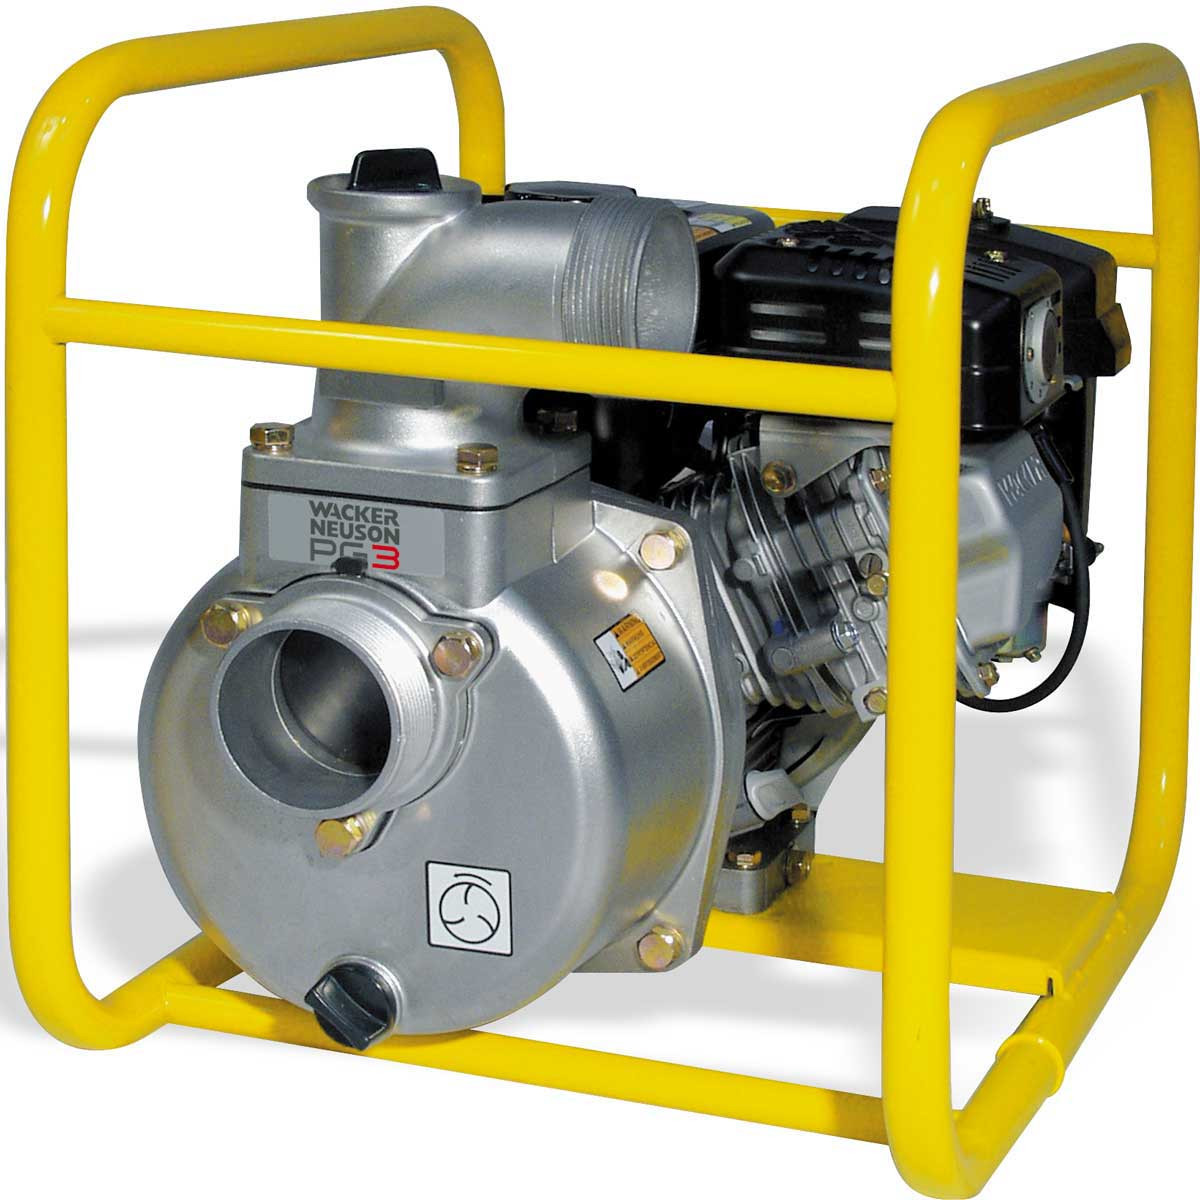 Wacker Neuson PG3A 3 inch Centrifugal Dewatering Pump